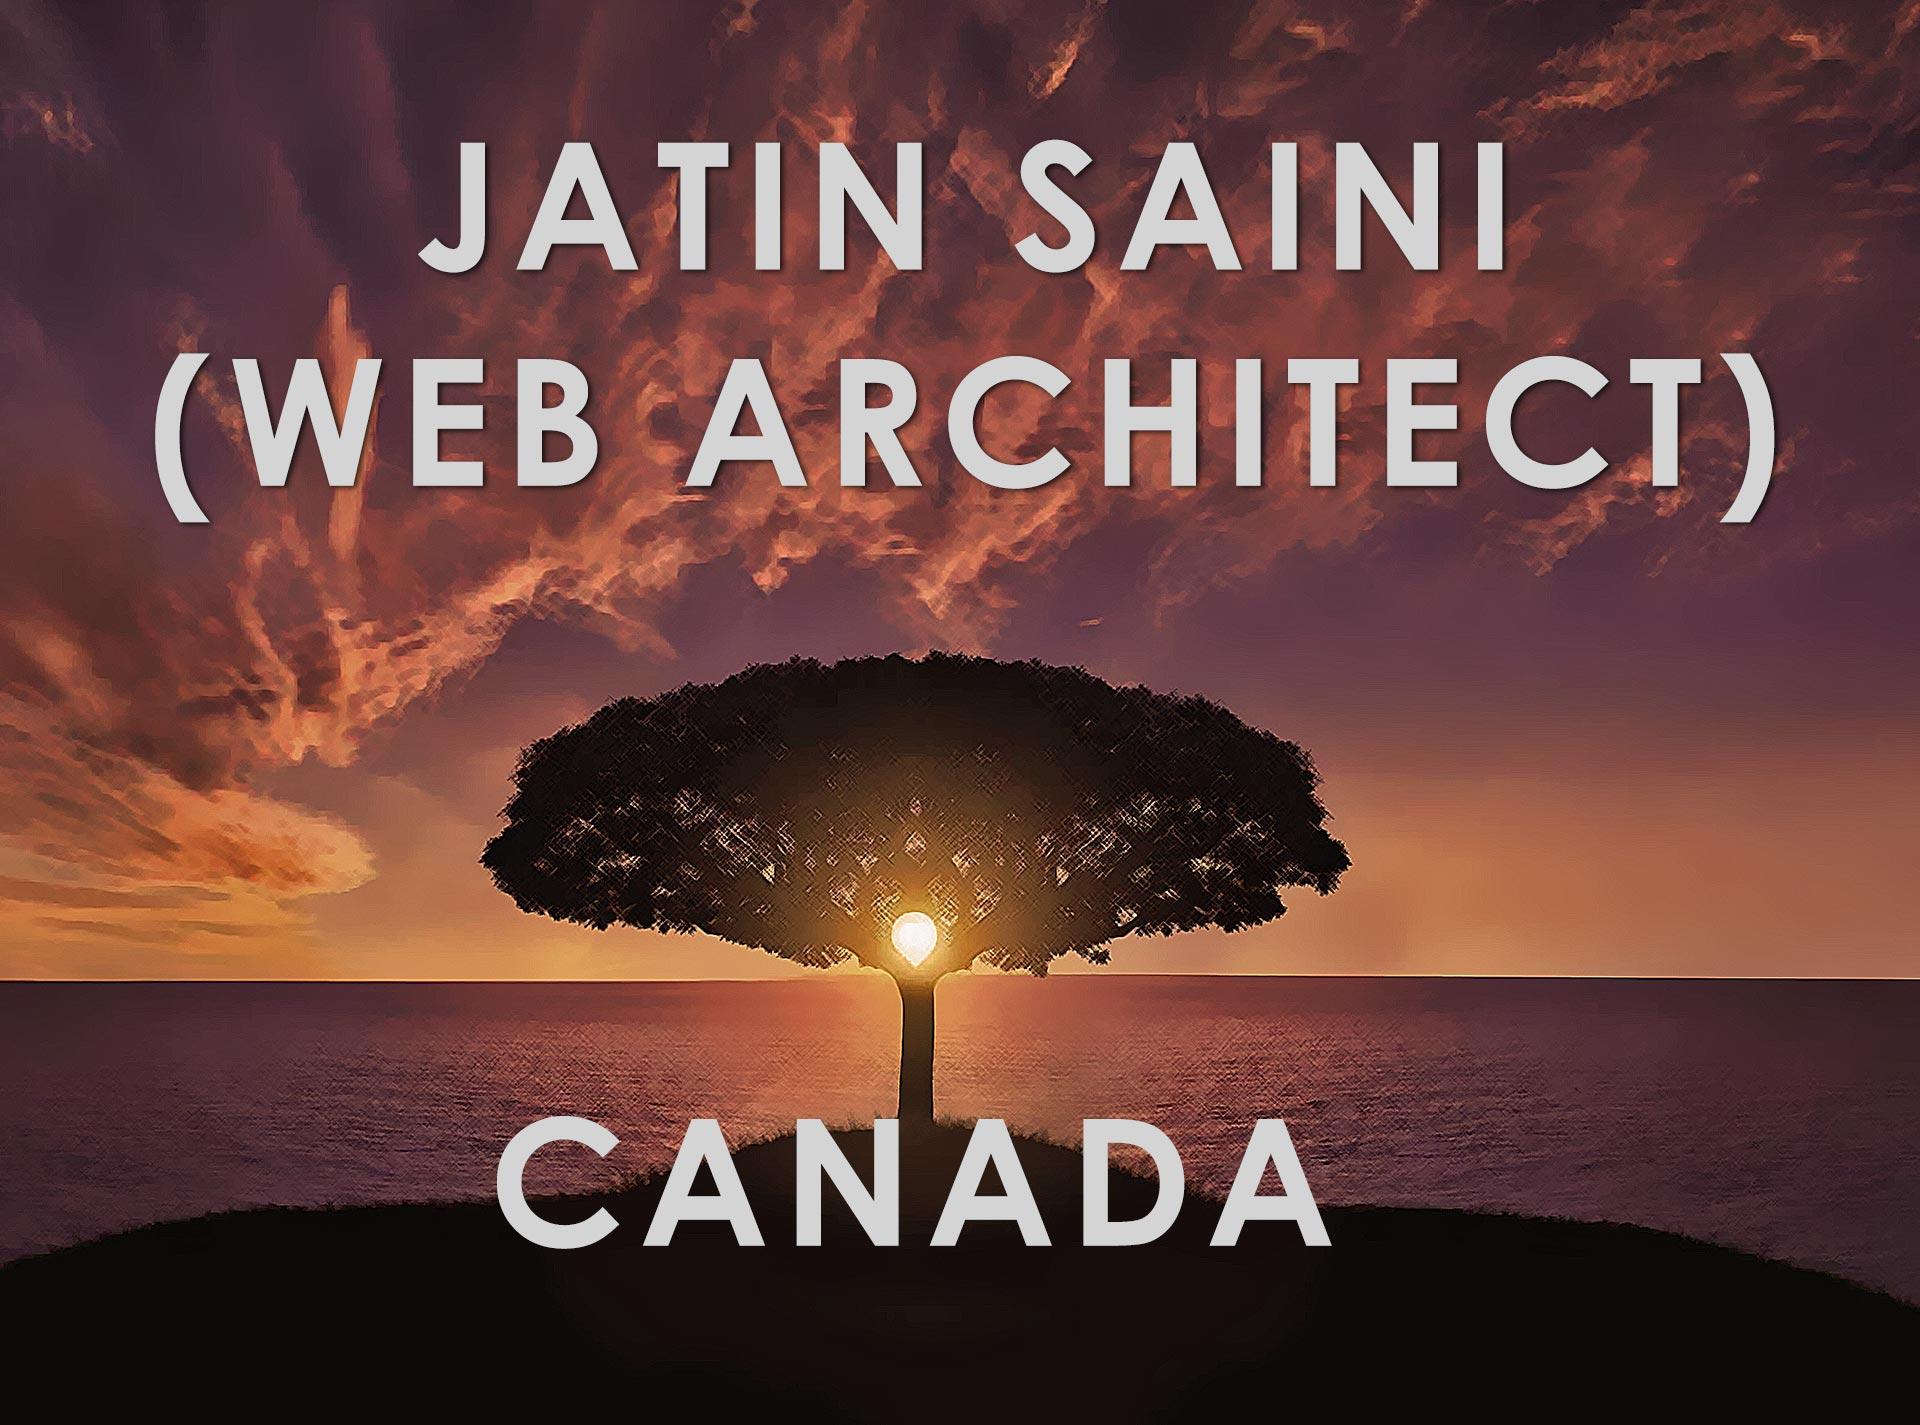 Web Architect Canada Jatin Saini